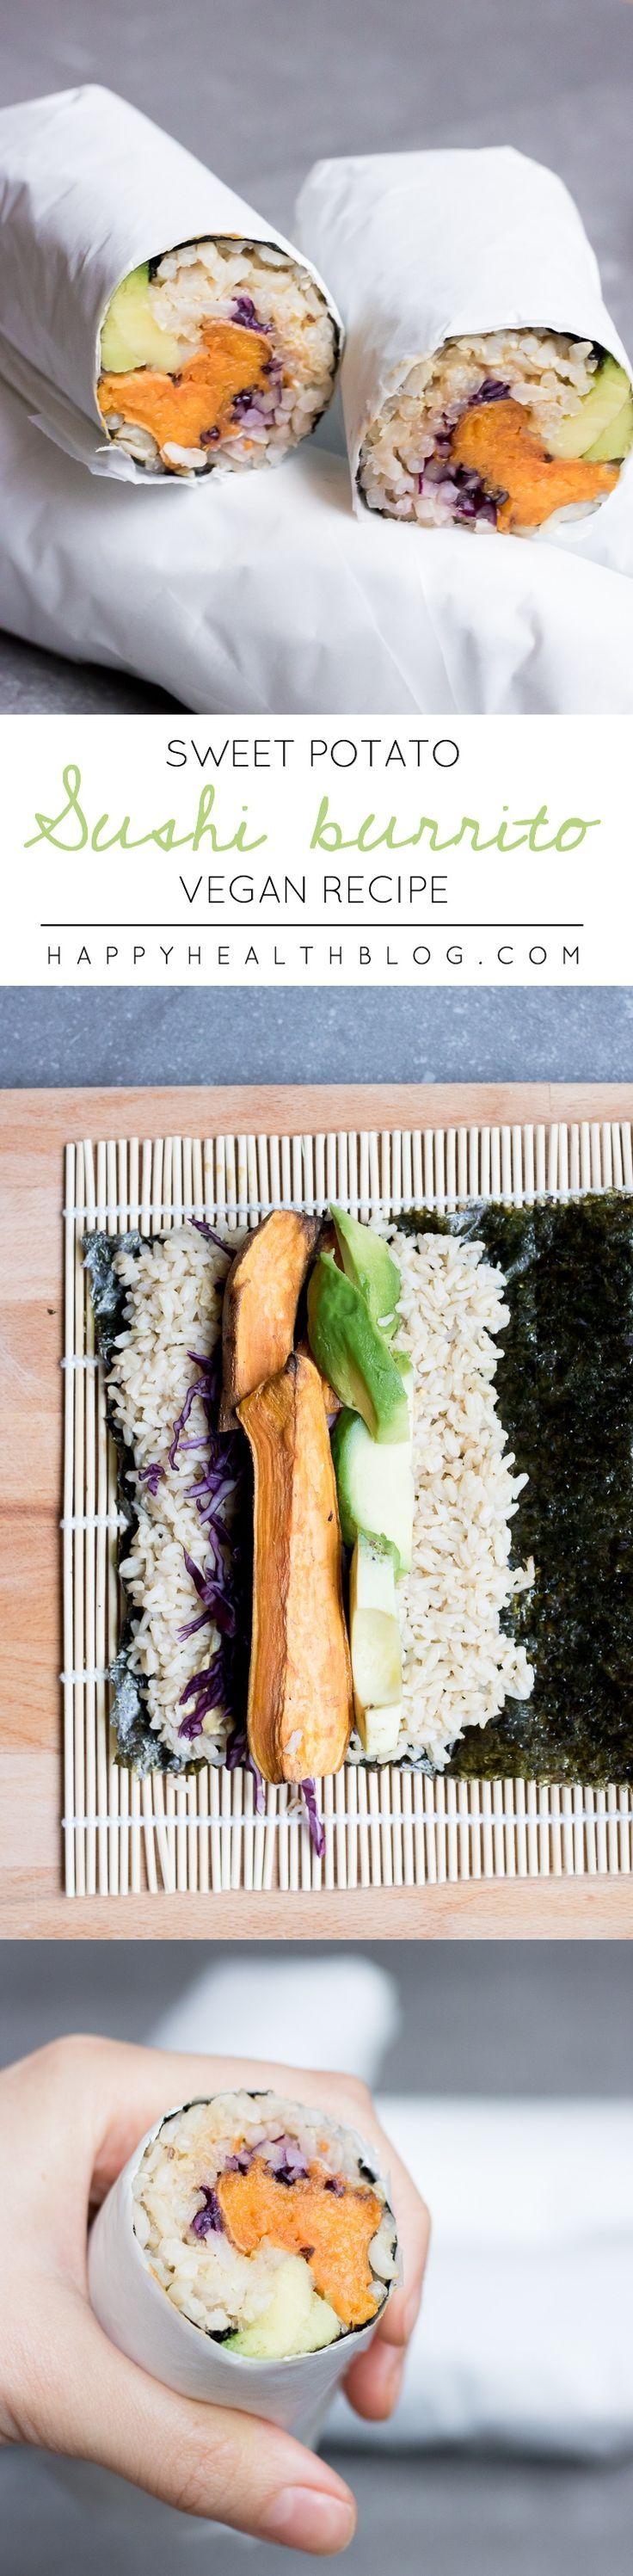 SWEET POTATO SUSHI BURRITO - healthy, vegan, clean, recipe, organic…